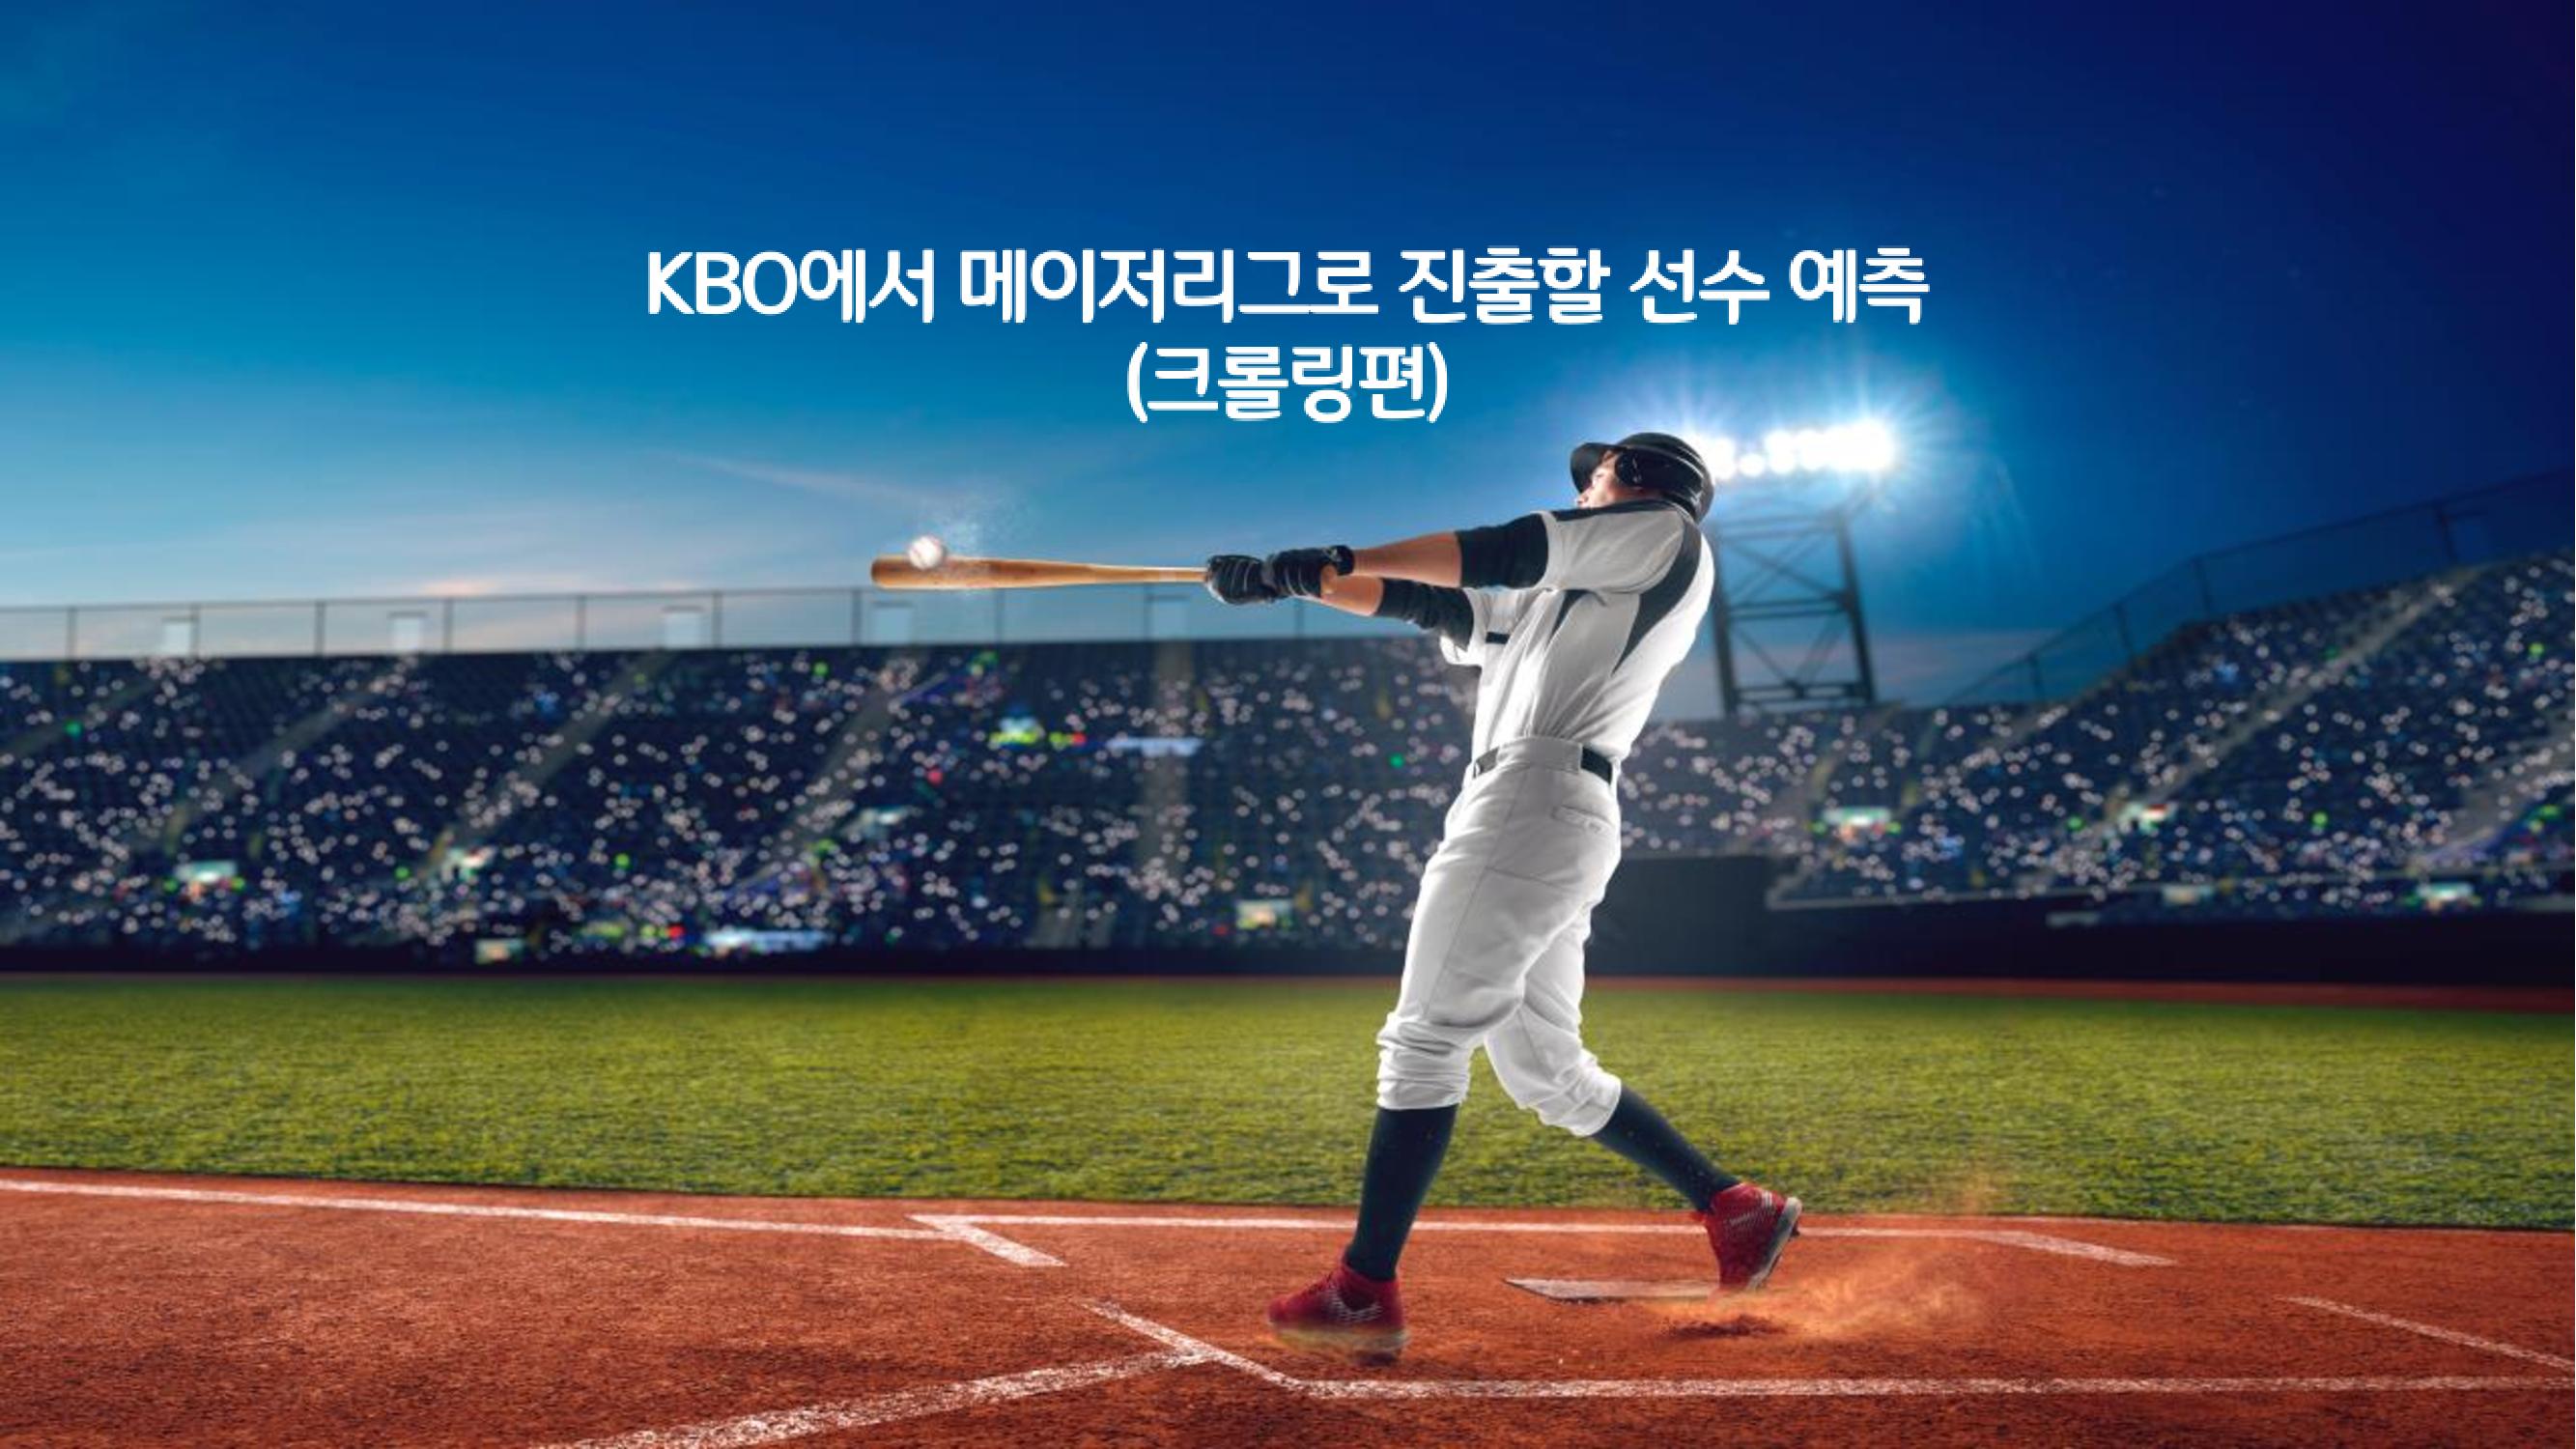 KBO에서 메이저리그로 진출할 선수 예측 (크롤링편)